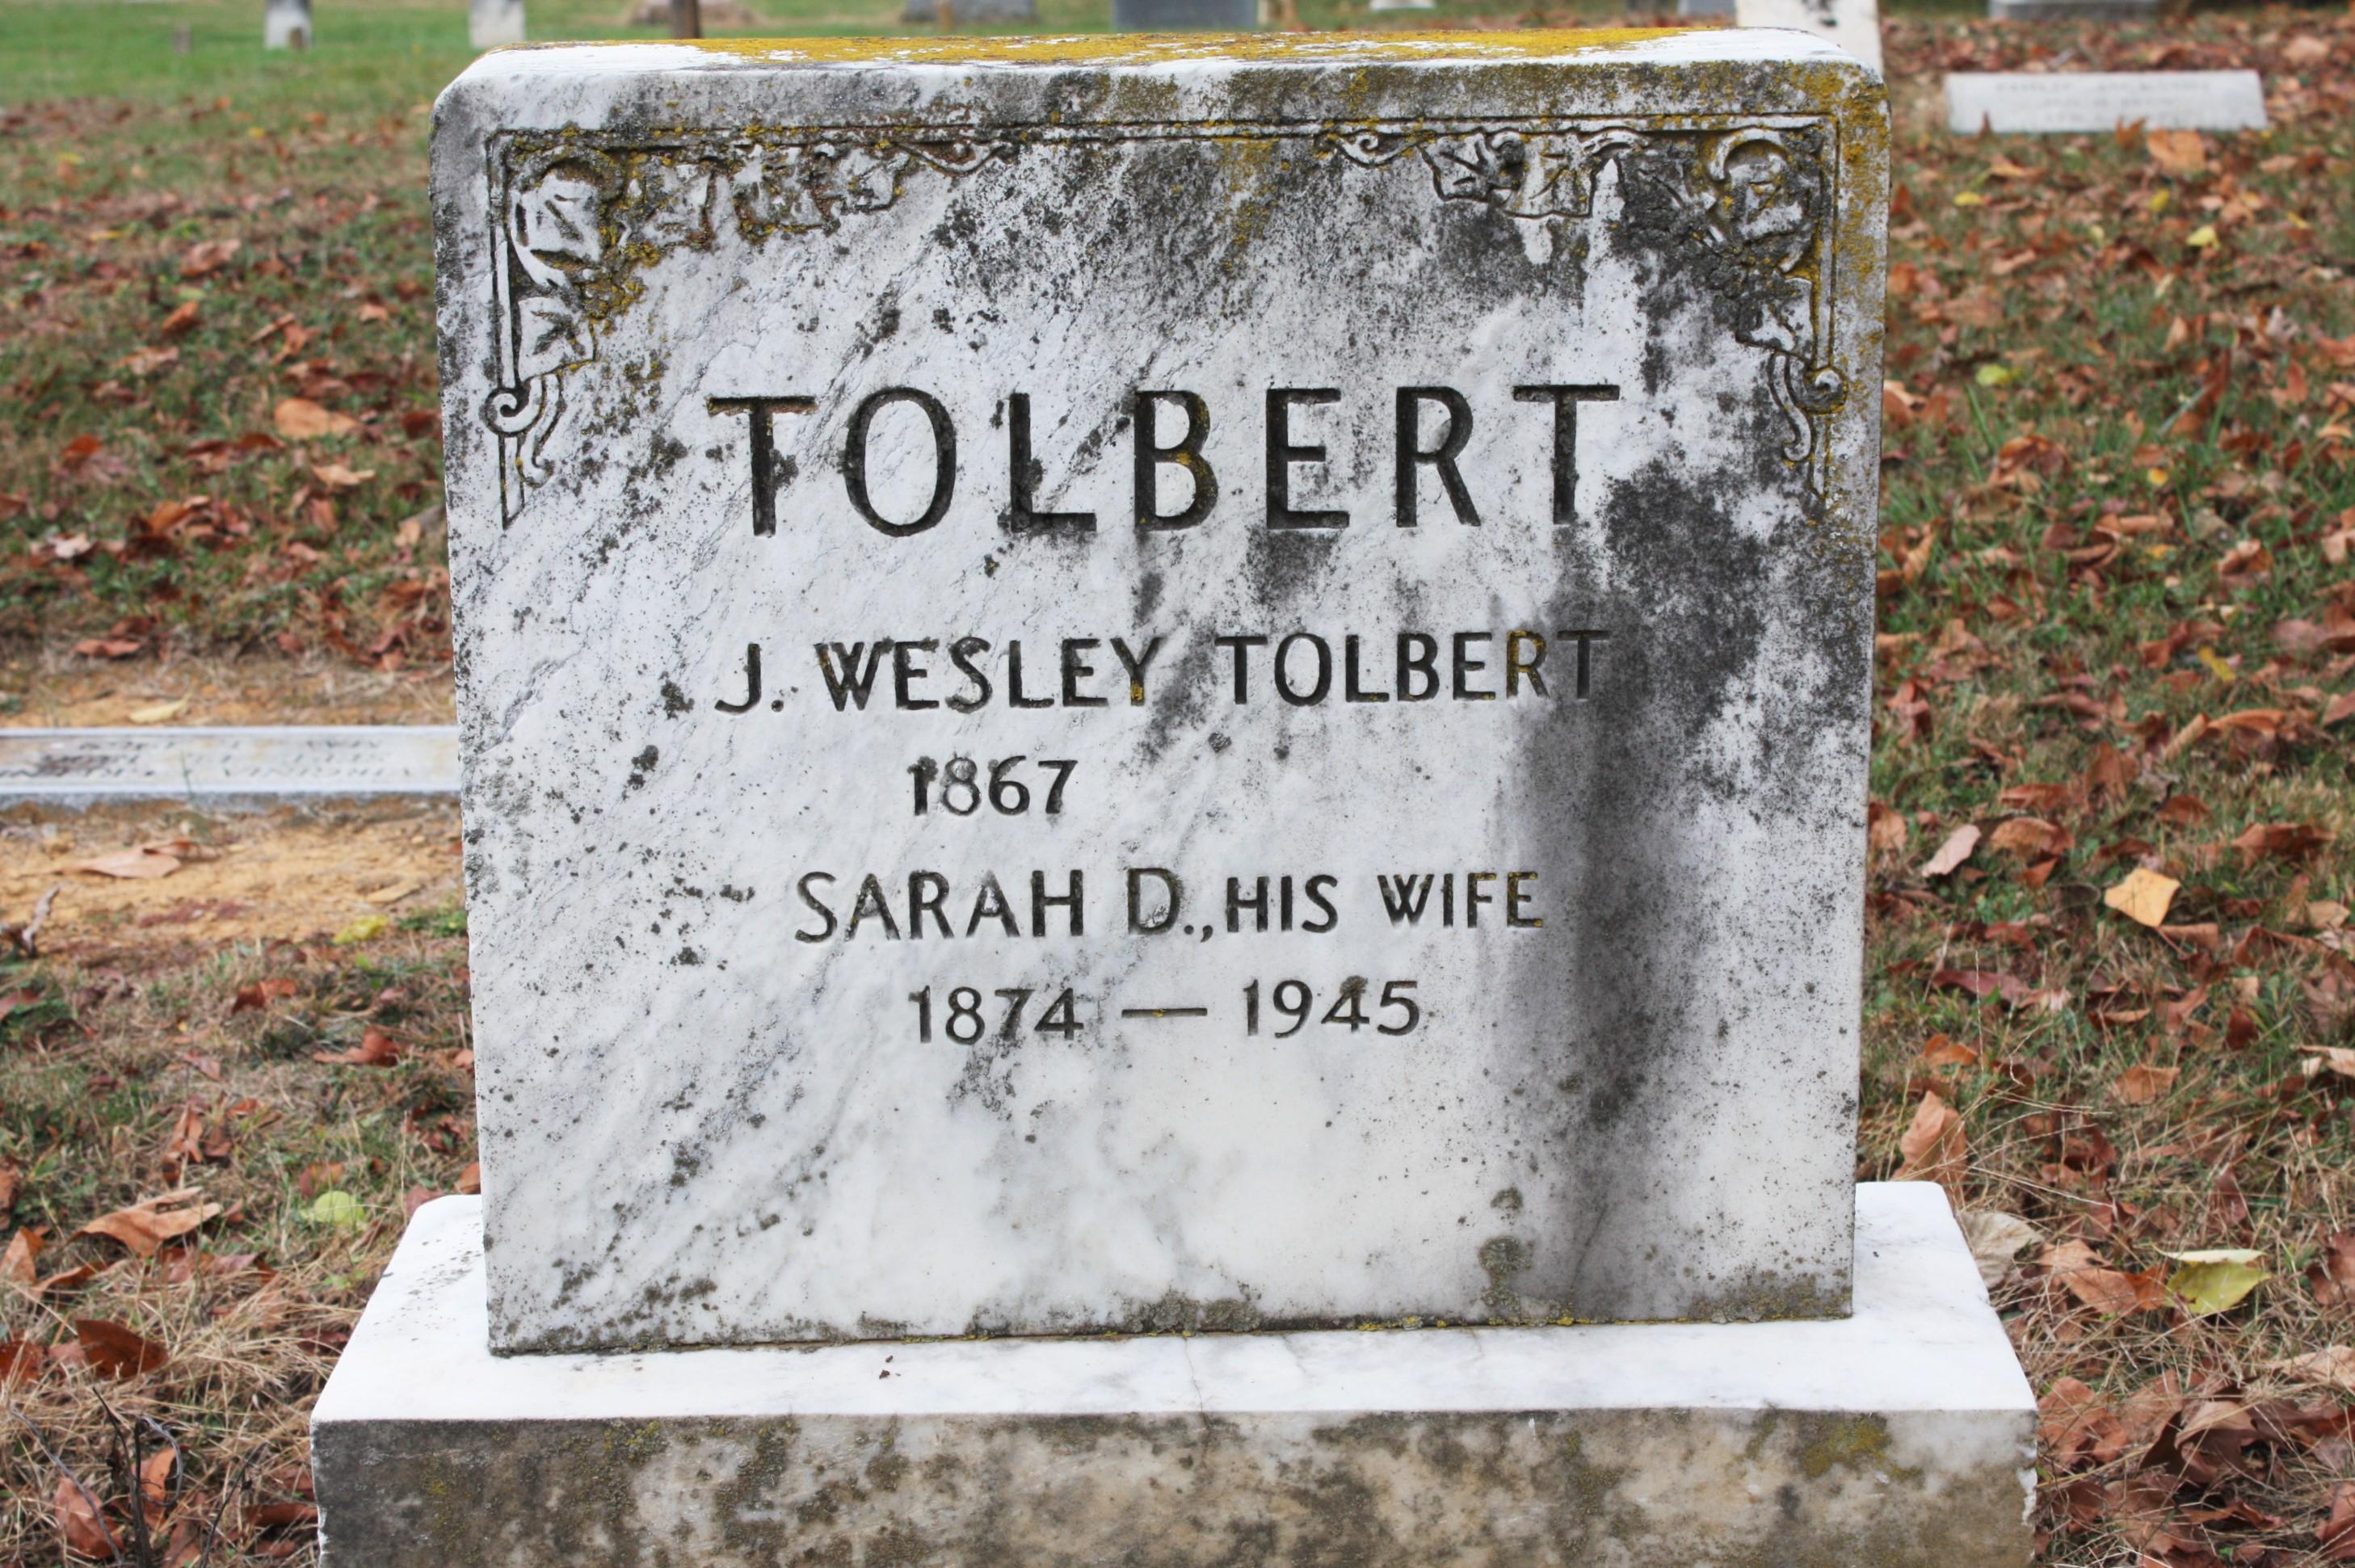 John Wesley Tolbert